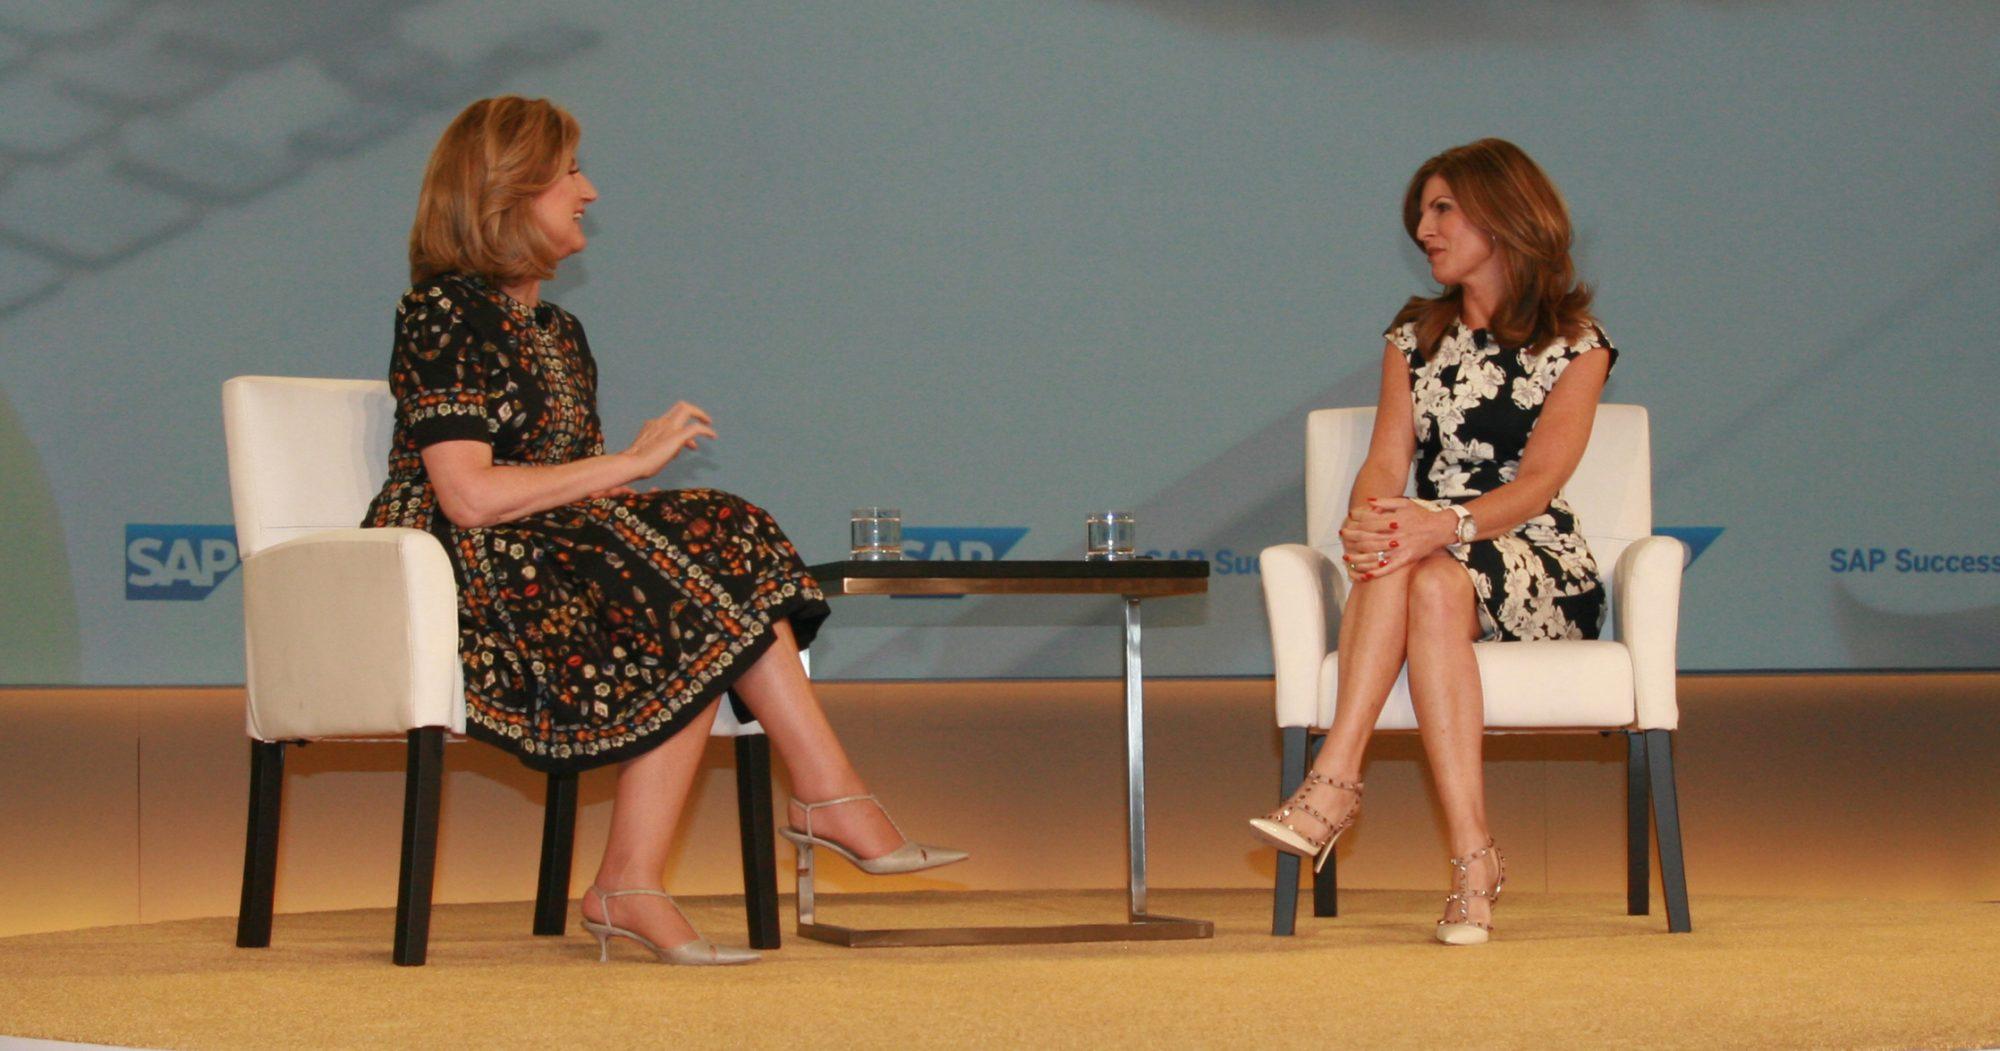 SAP Slideshow 1a - Arianna Huffington